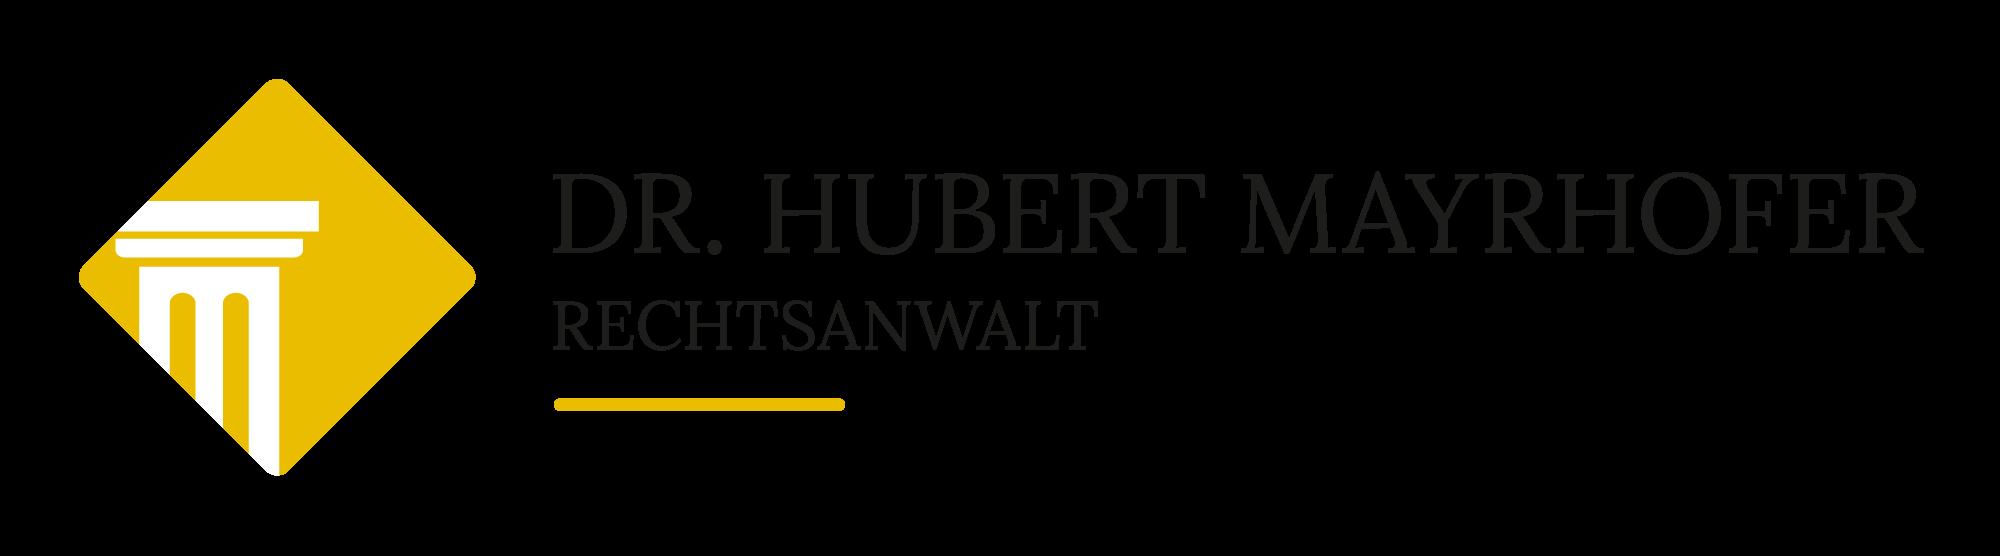 Dr. Hubert Mayrhofer